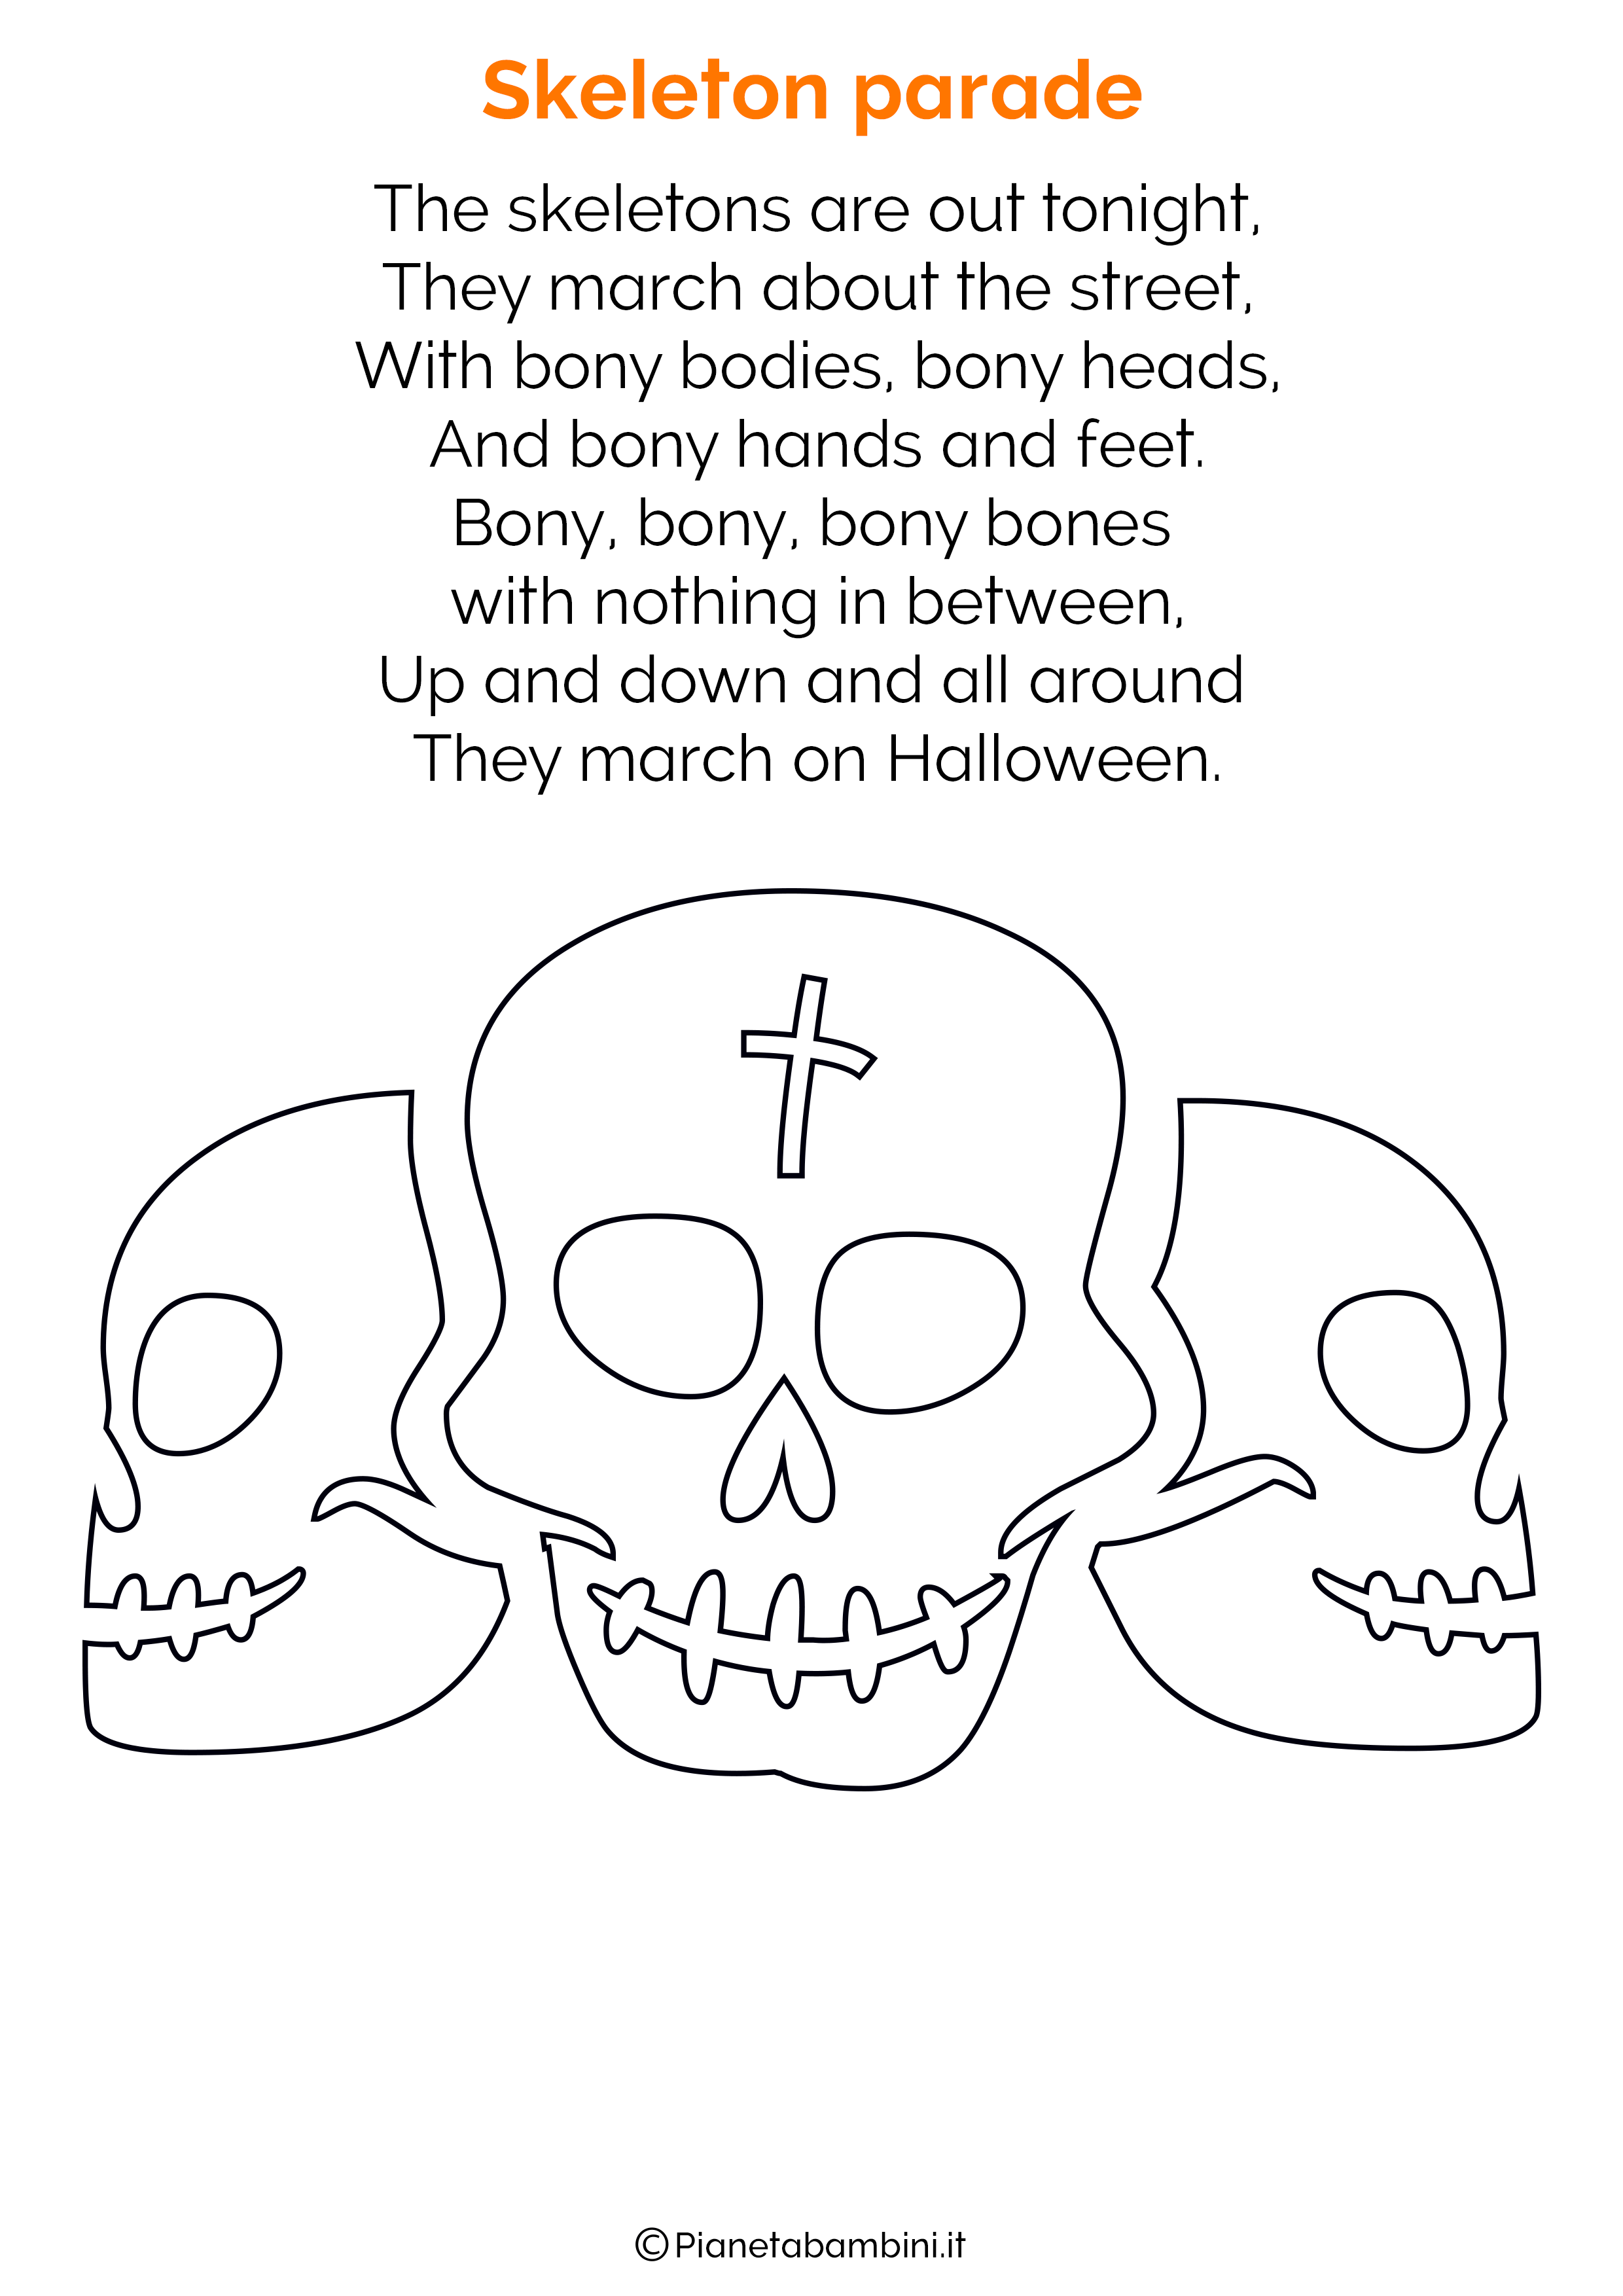 Filastrocca di Halloween in Inglese per bambini 11